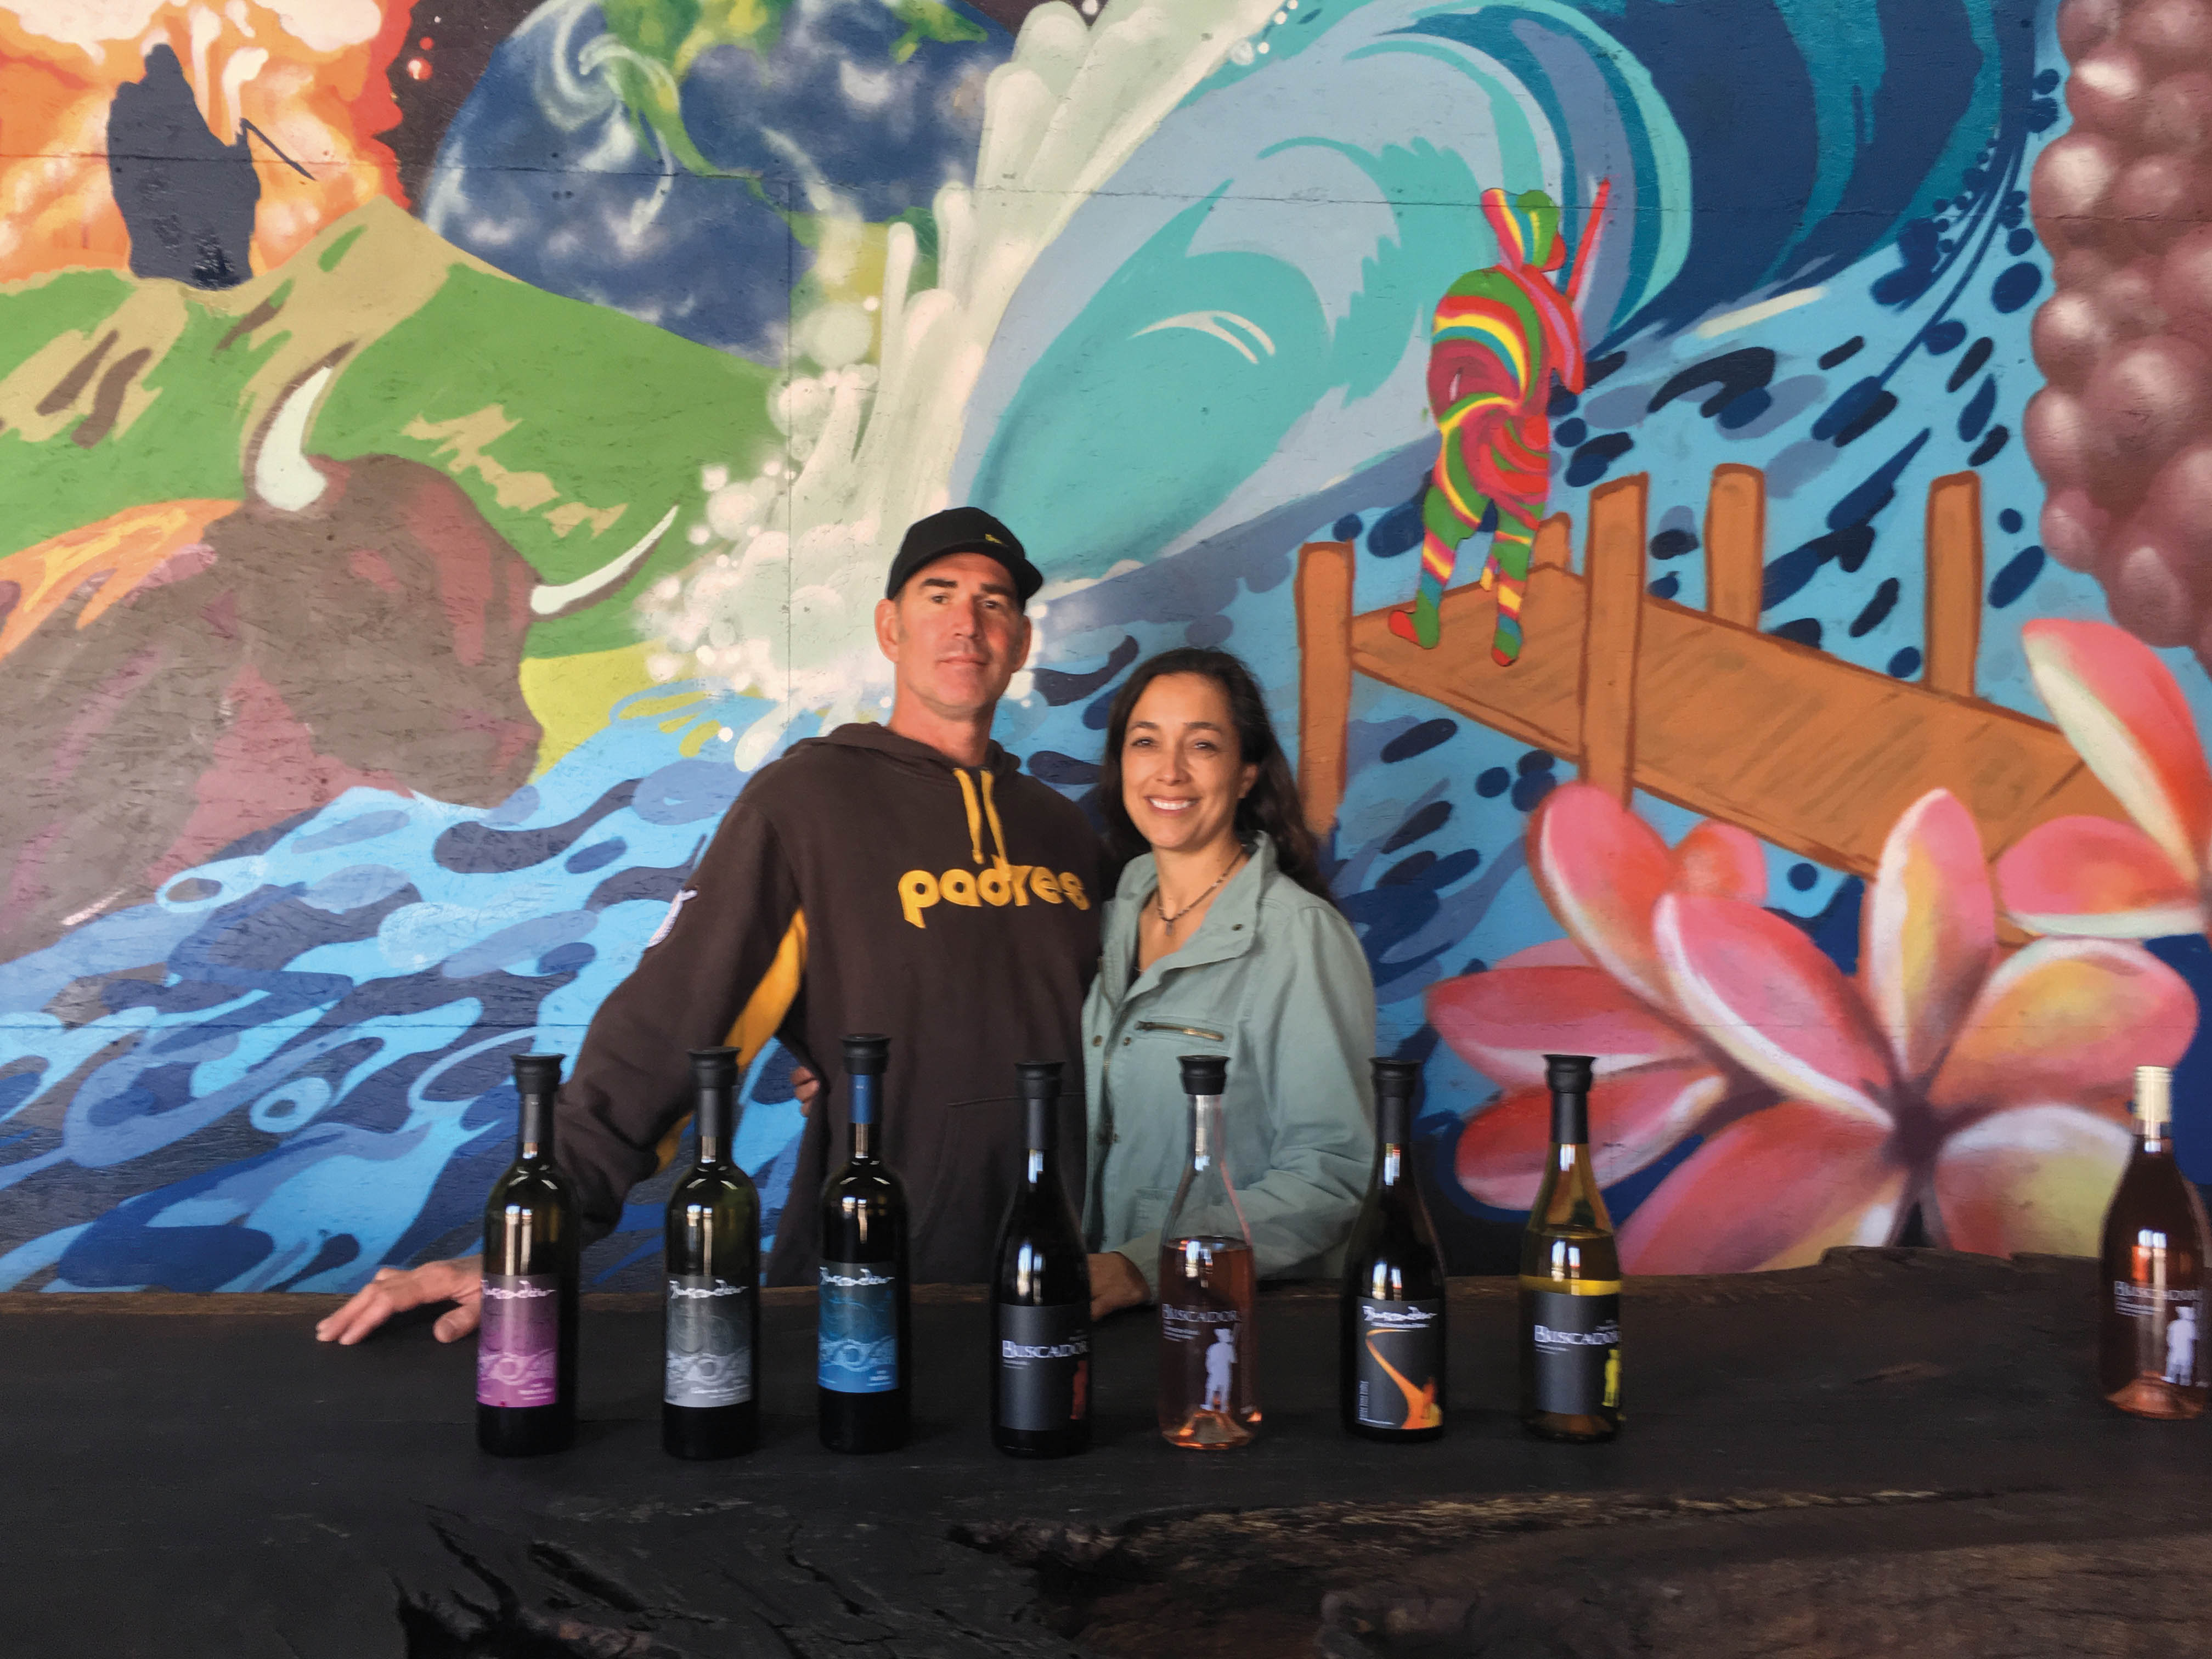 Buscador Opens New Tasting Room in Buellton - The Santa Barbara